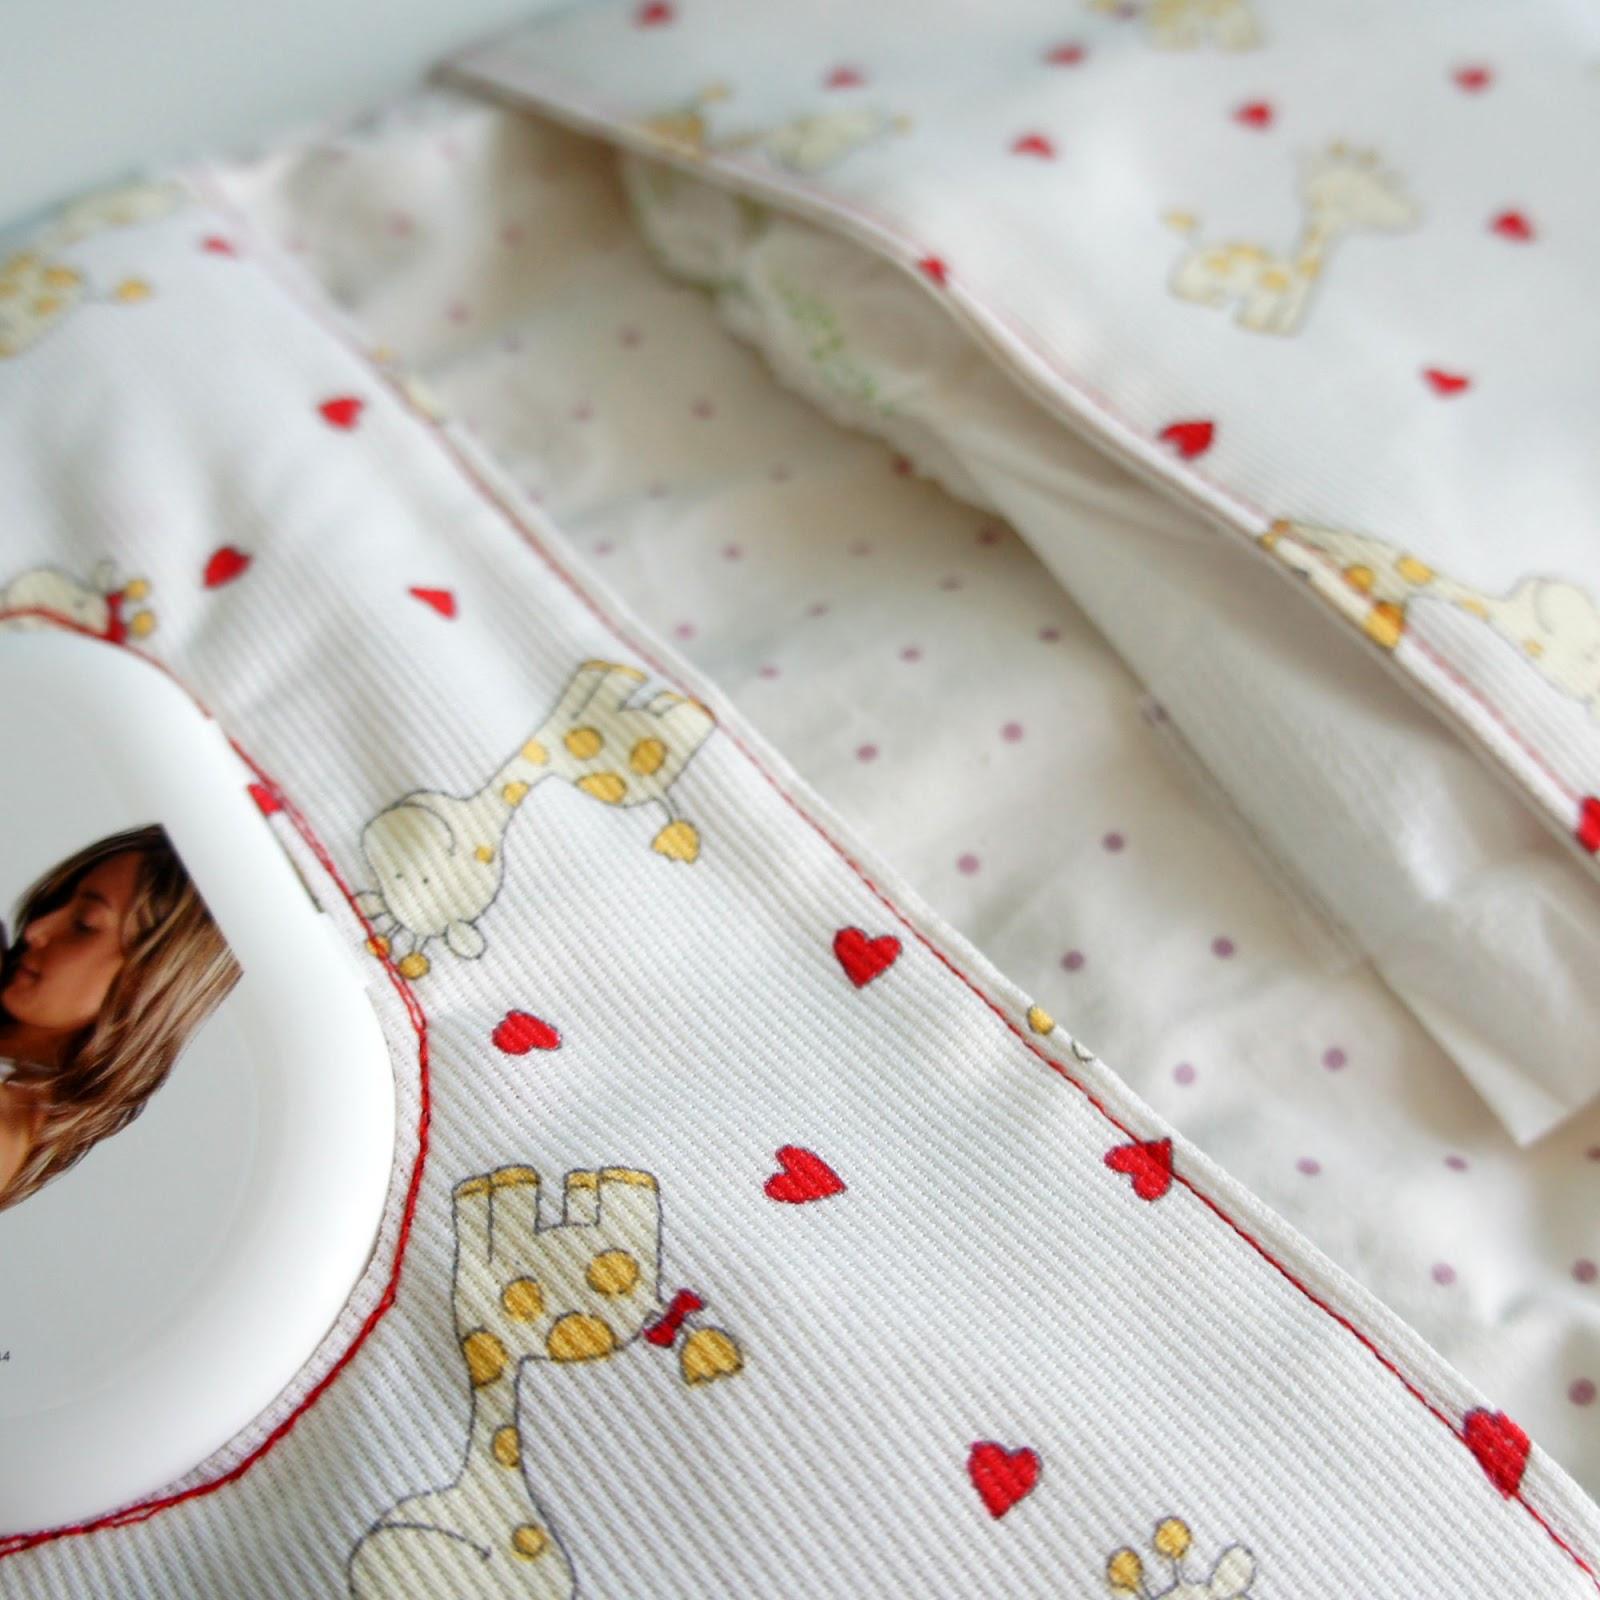 pinafili: Pinafili Films. Bolsa para los pañales y toallitas del bebe.